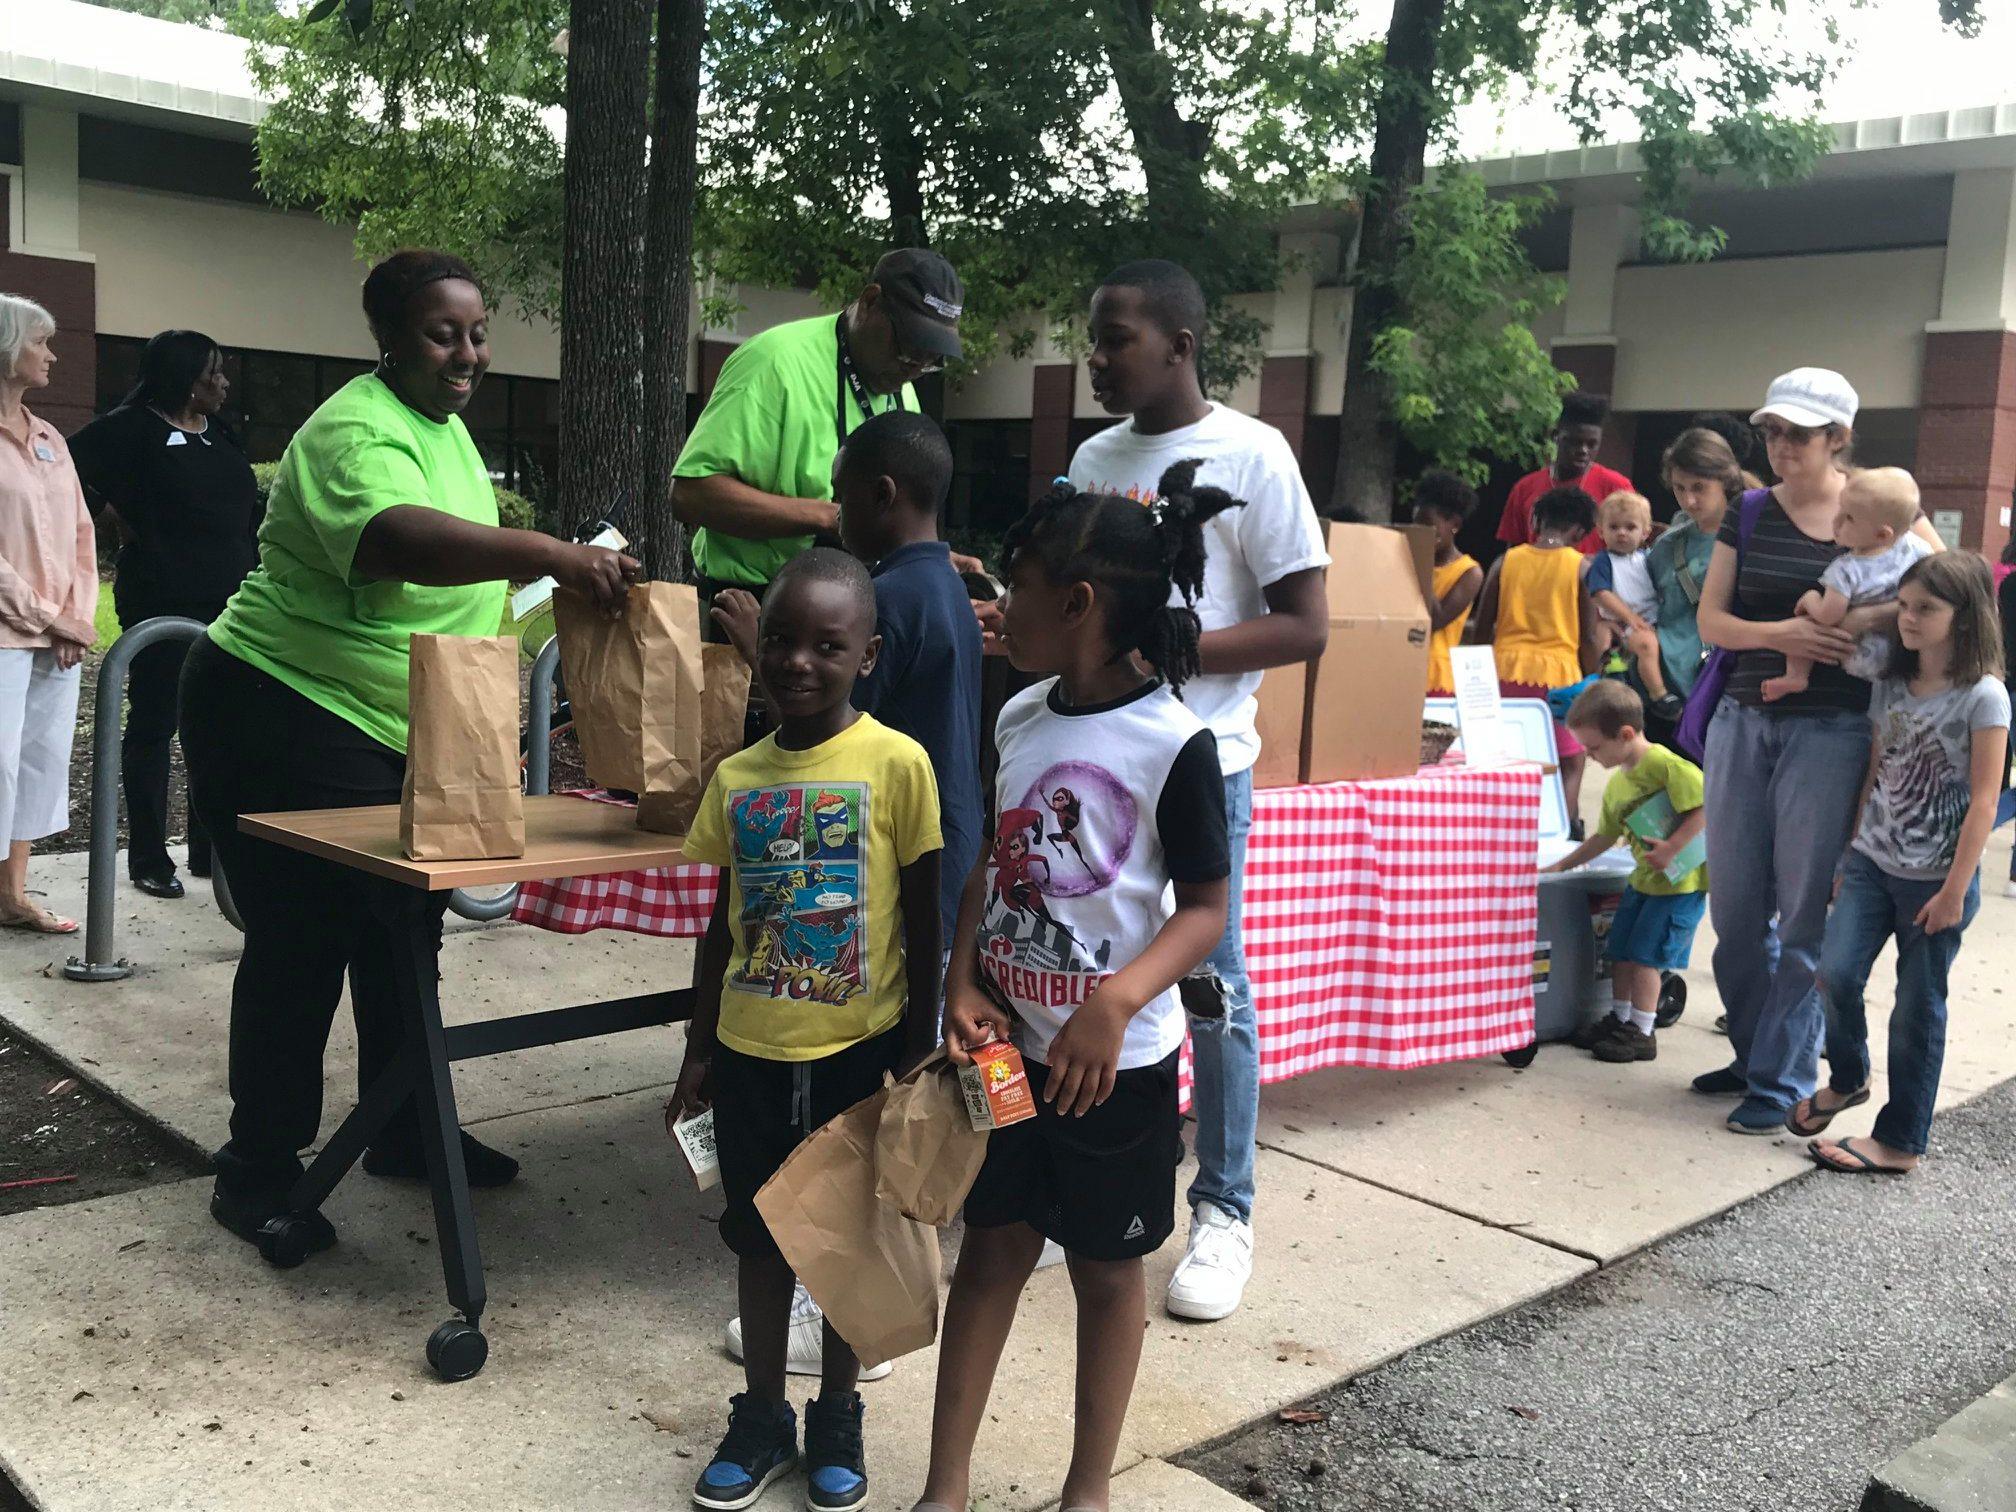 Free Meals for Kids and Teens - Summer Feeding Program Begins June 8